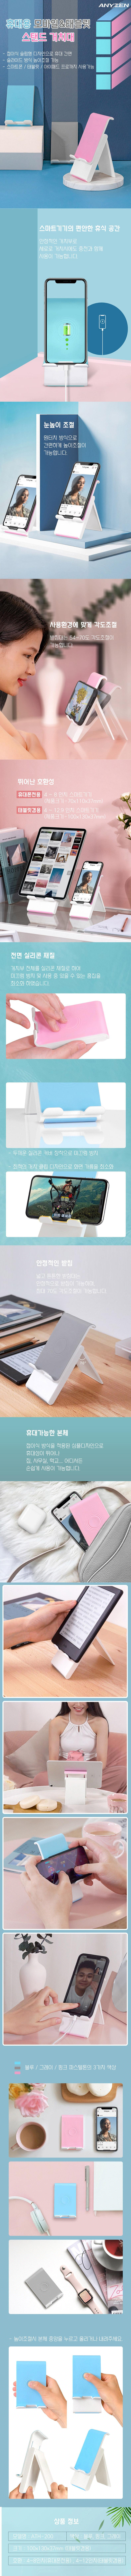 ANYZEN 접이식 스마트폰/테블릿 스탠드 거치대 ATH-200